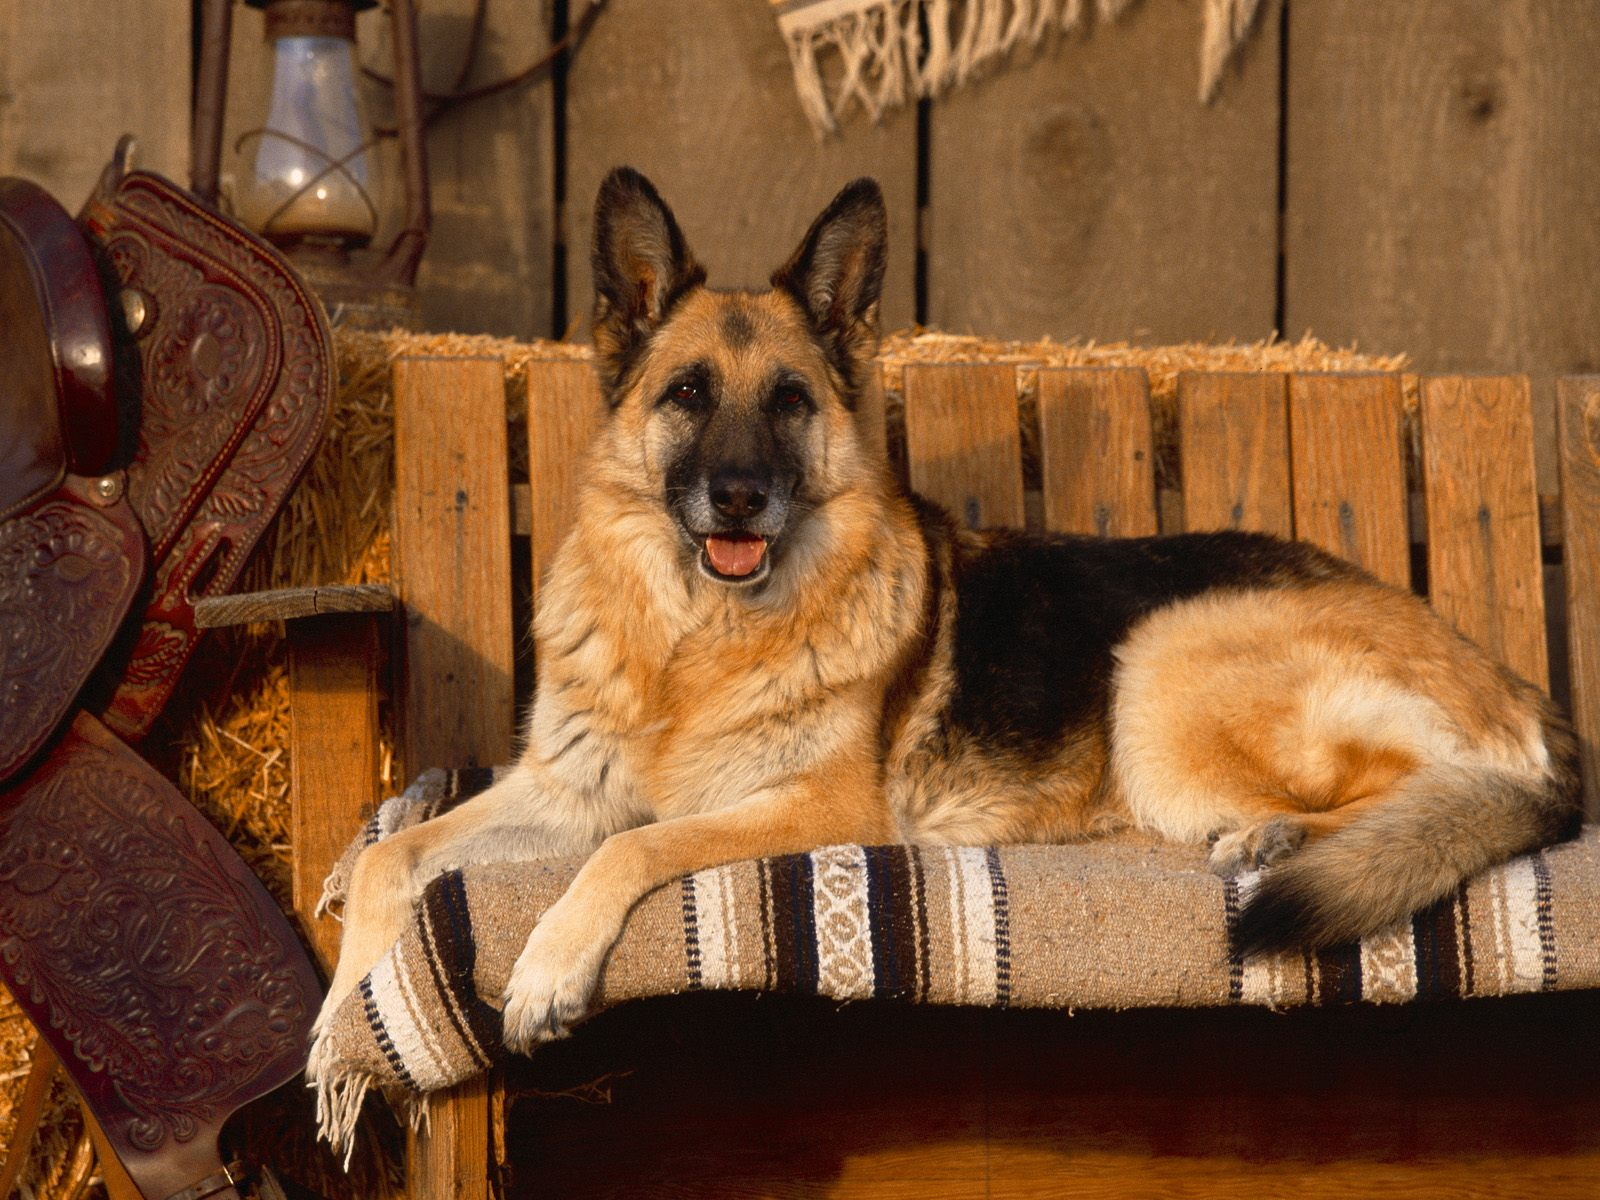 Messi Wallpaper 2014 3d German Shepherd Dog Hd Wallpapers 2013 All About Hd